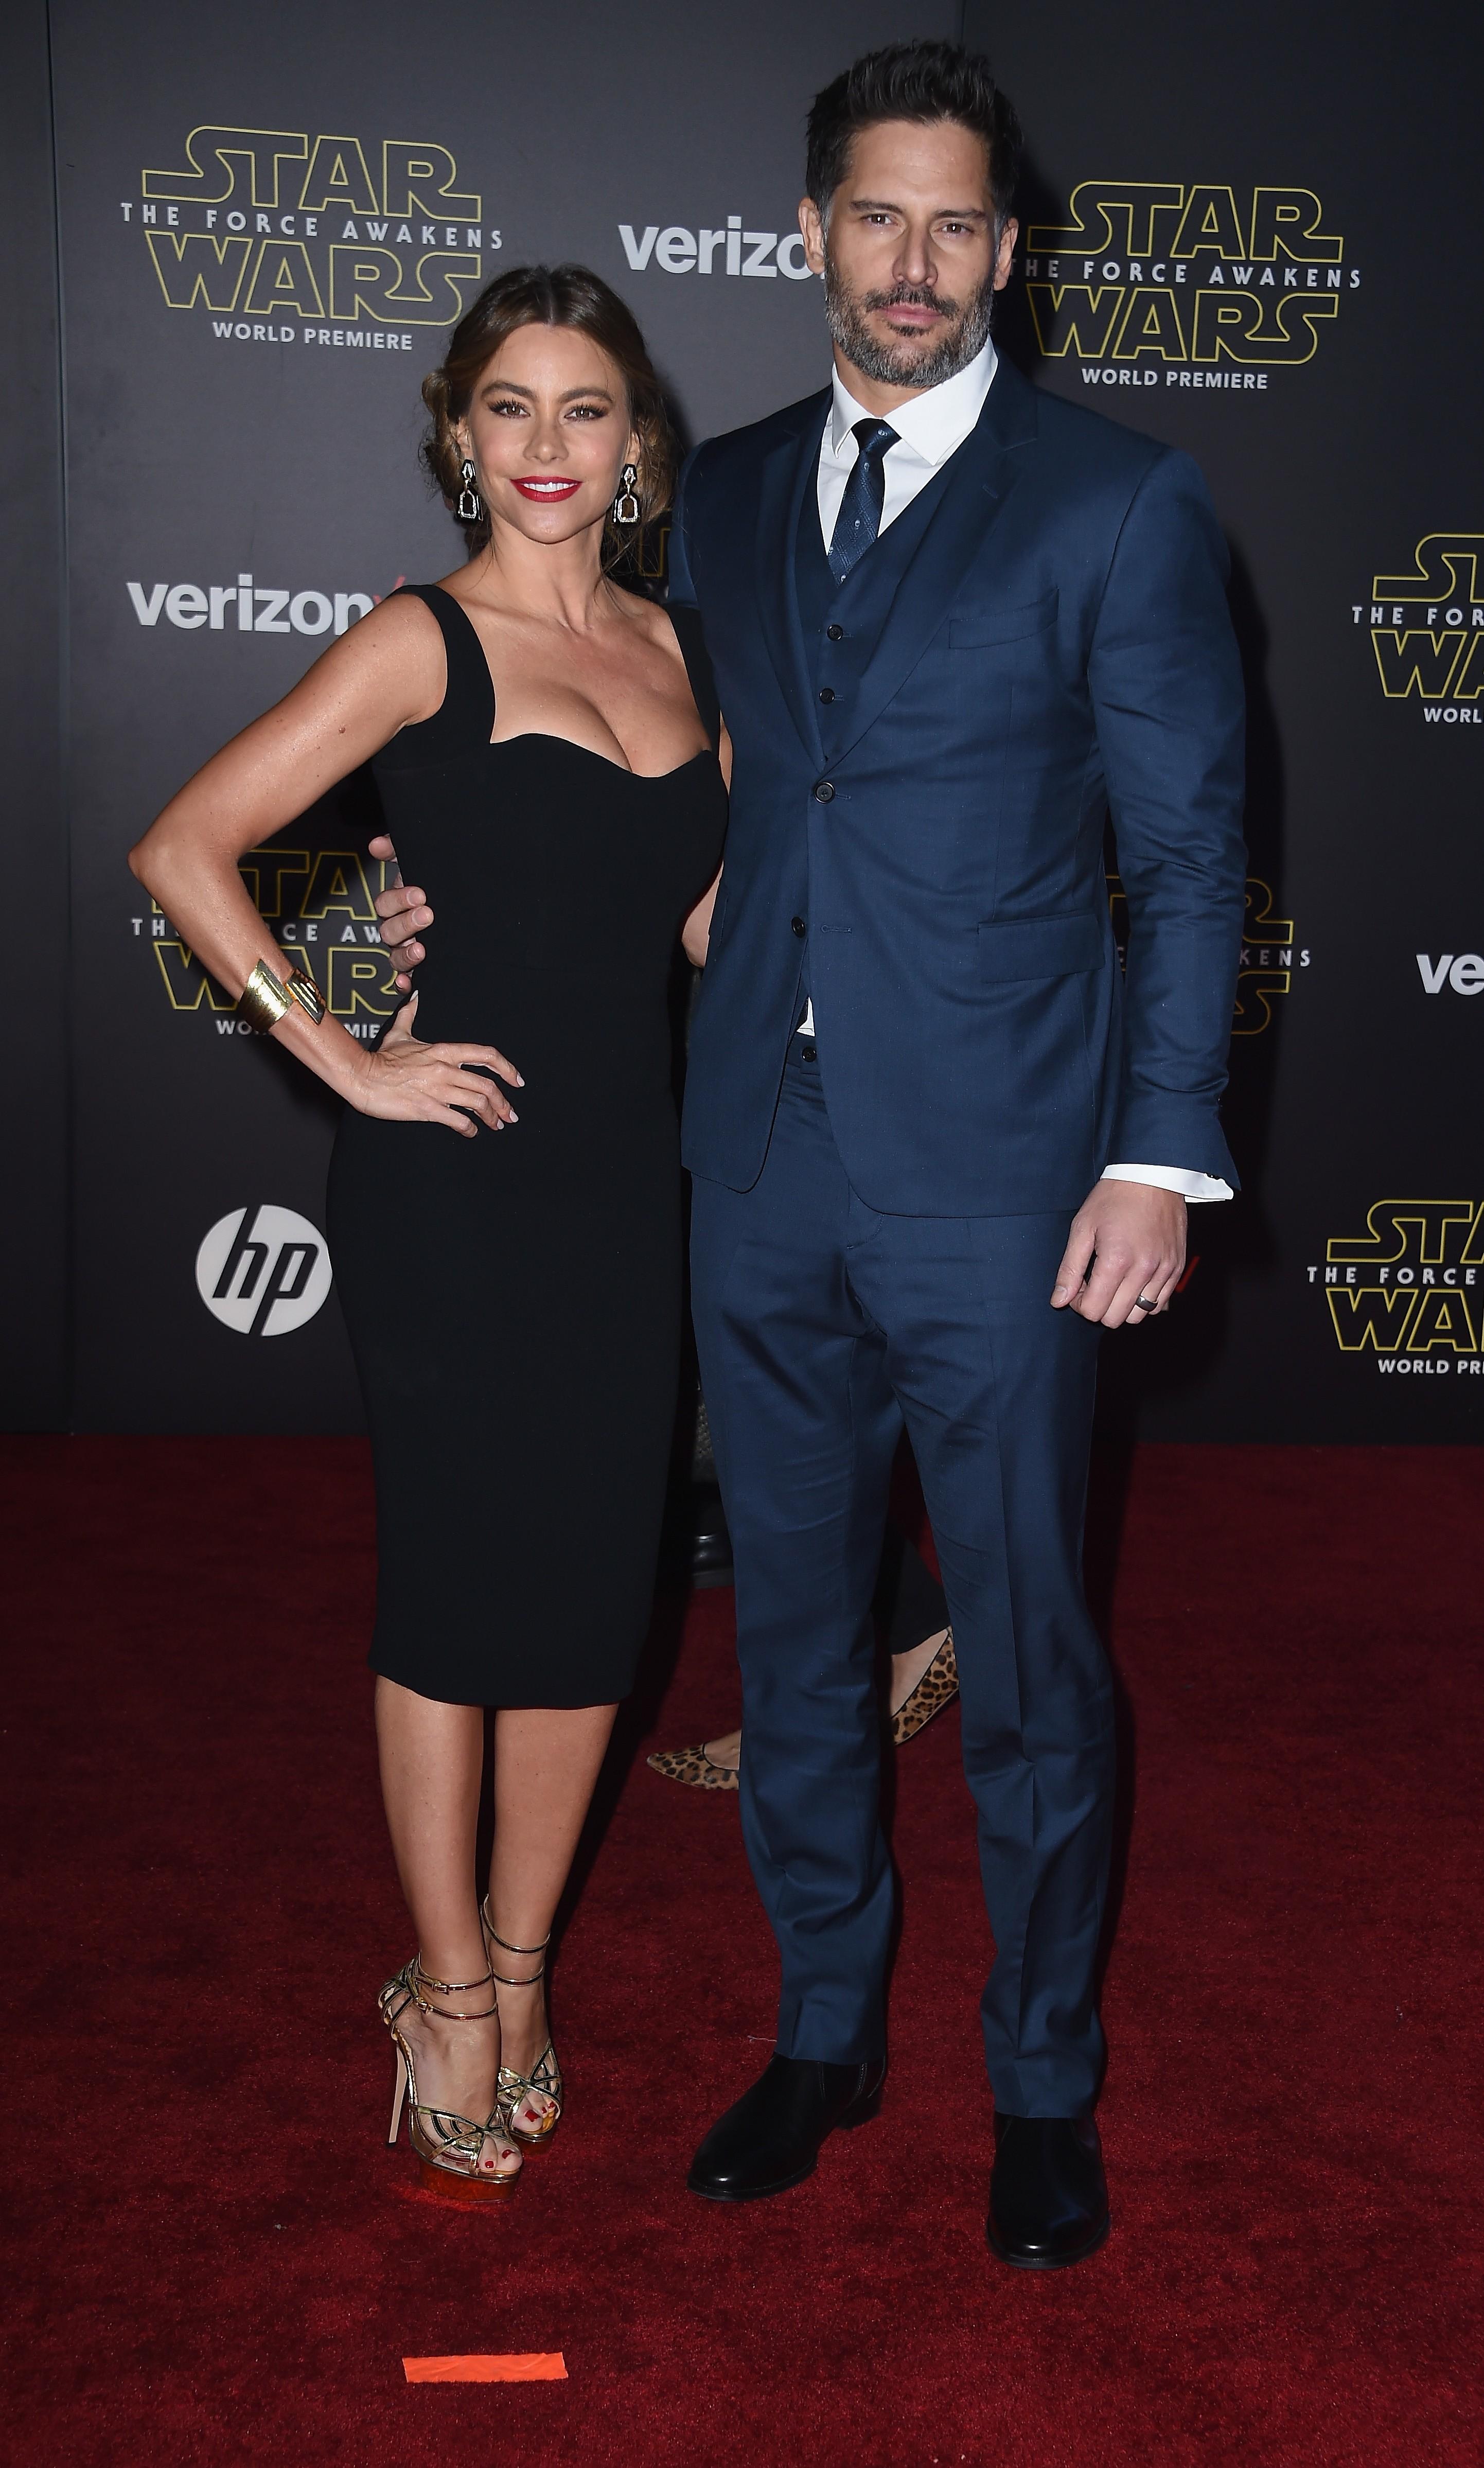 Sofia Vergara and Joe Manganiello make their red carpet debut as newlyweds